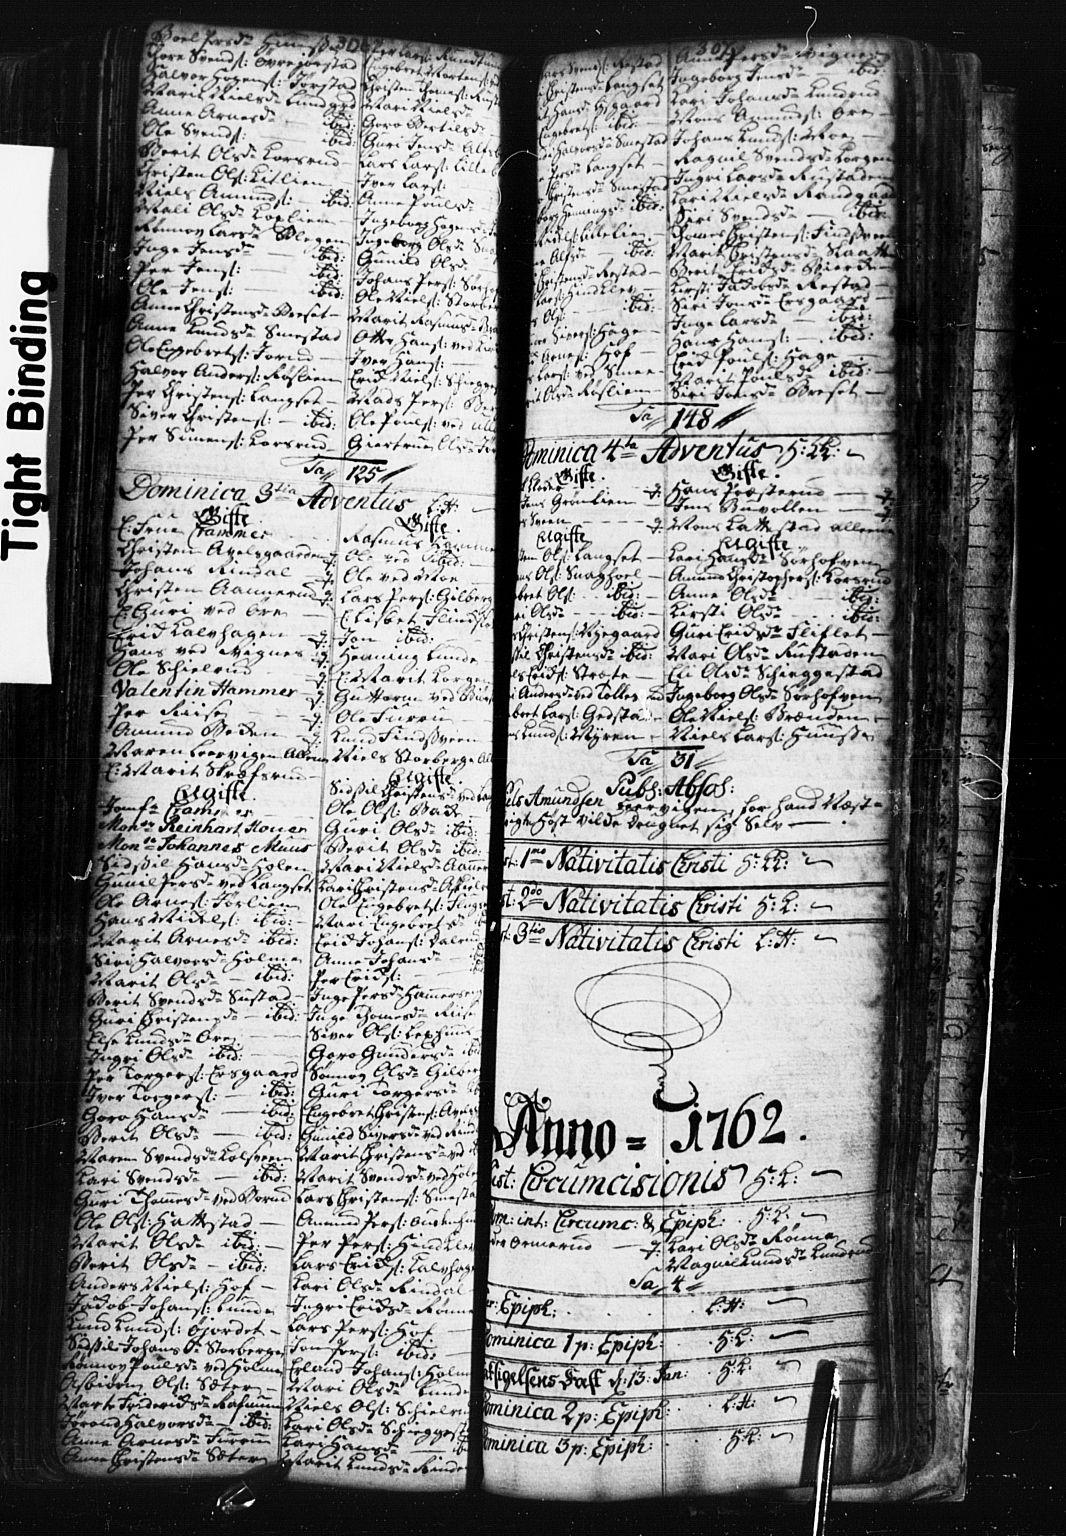 SAH, Fåberg prestekontor, Klokkerbok nr. 1, 1727-1767, s. 306-307